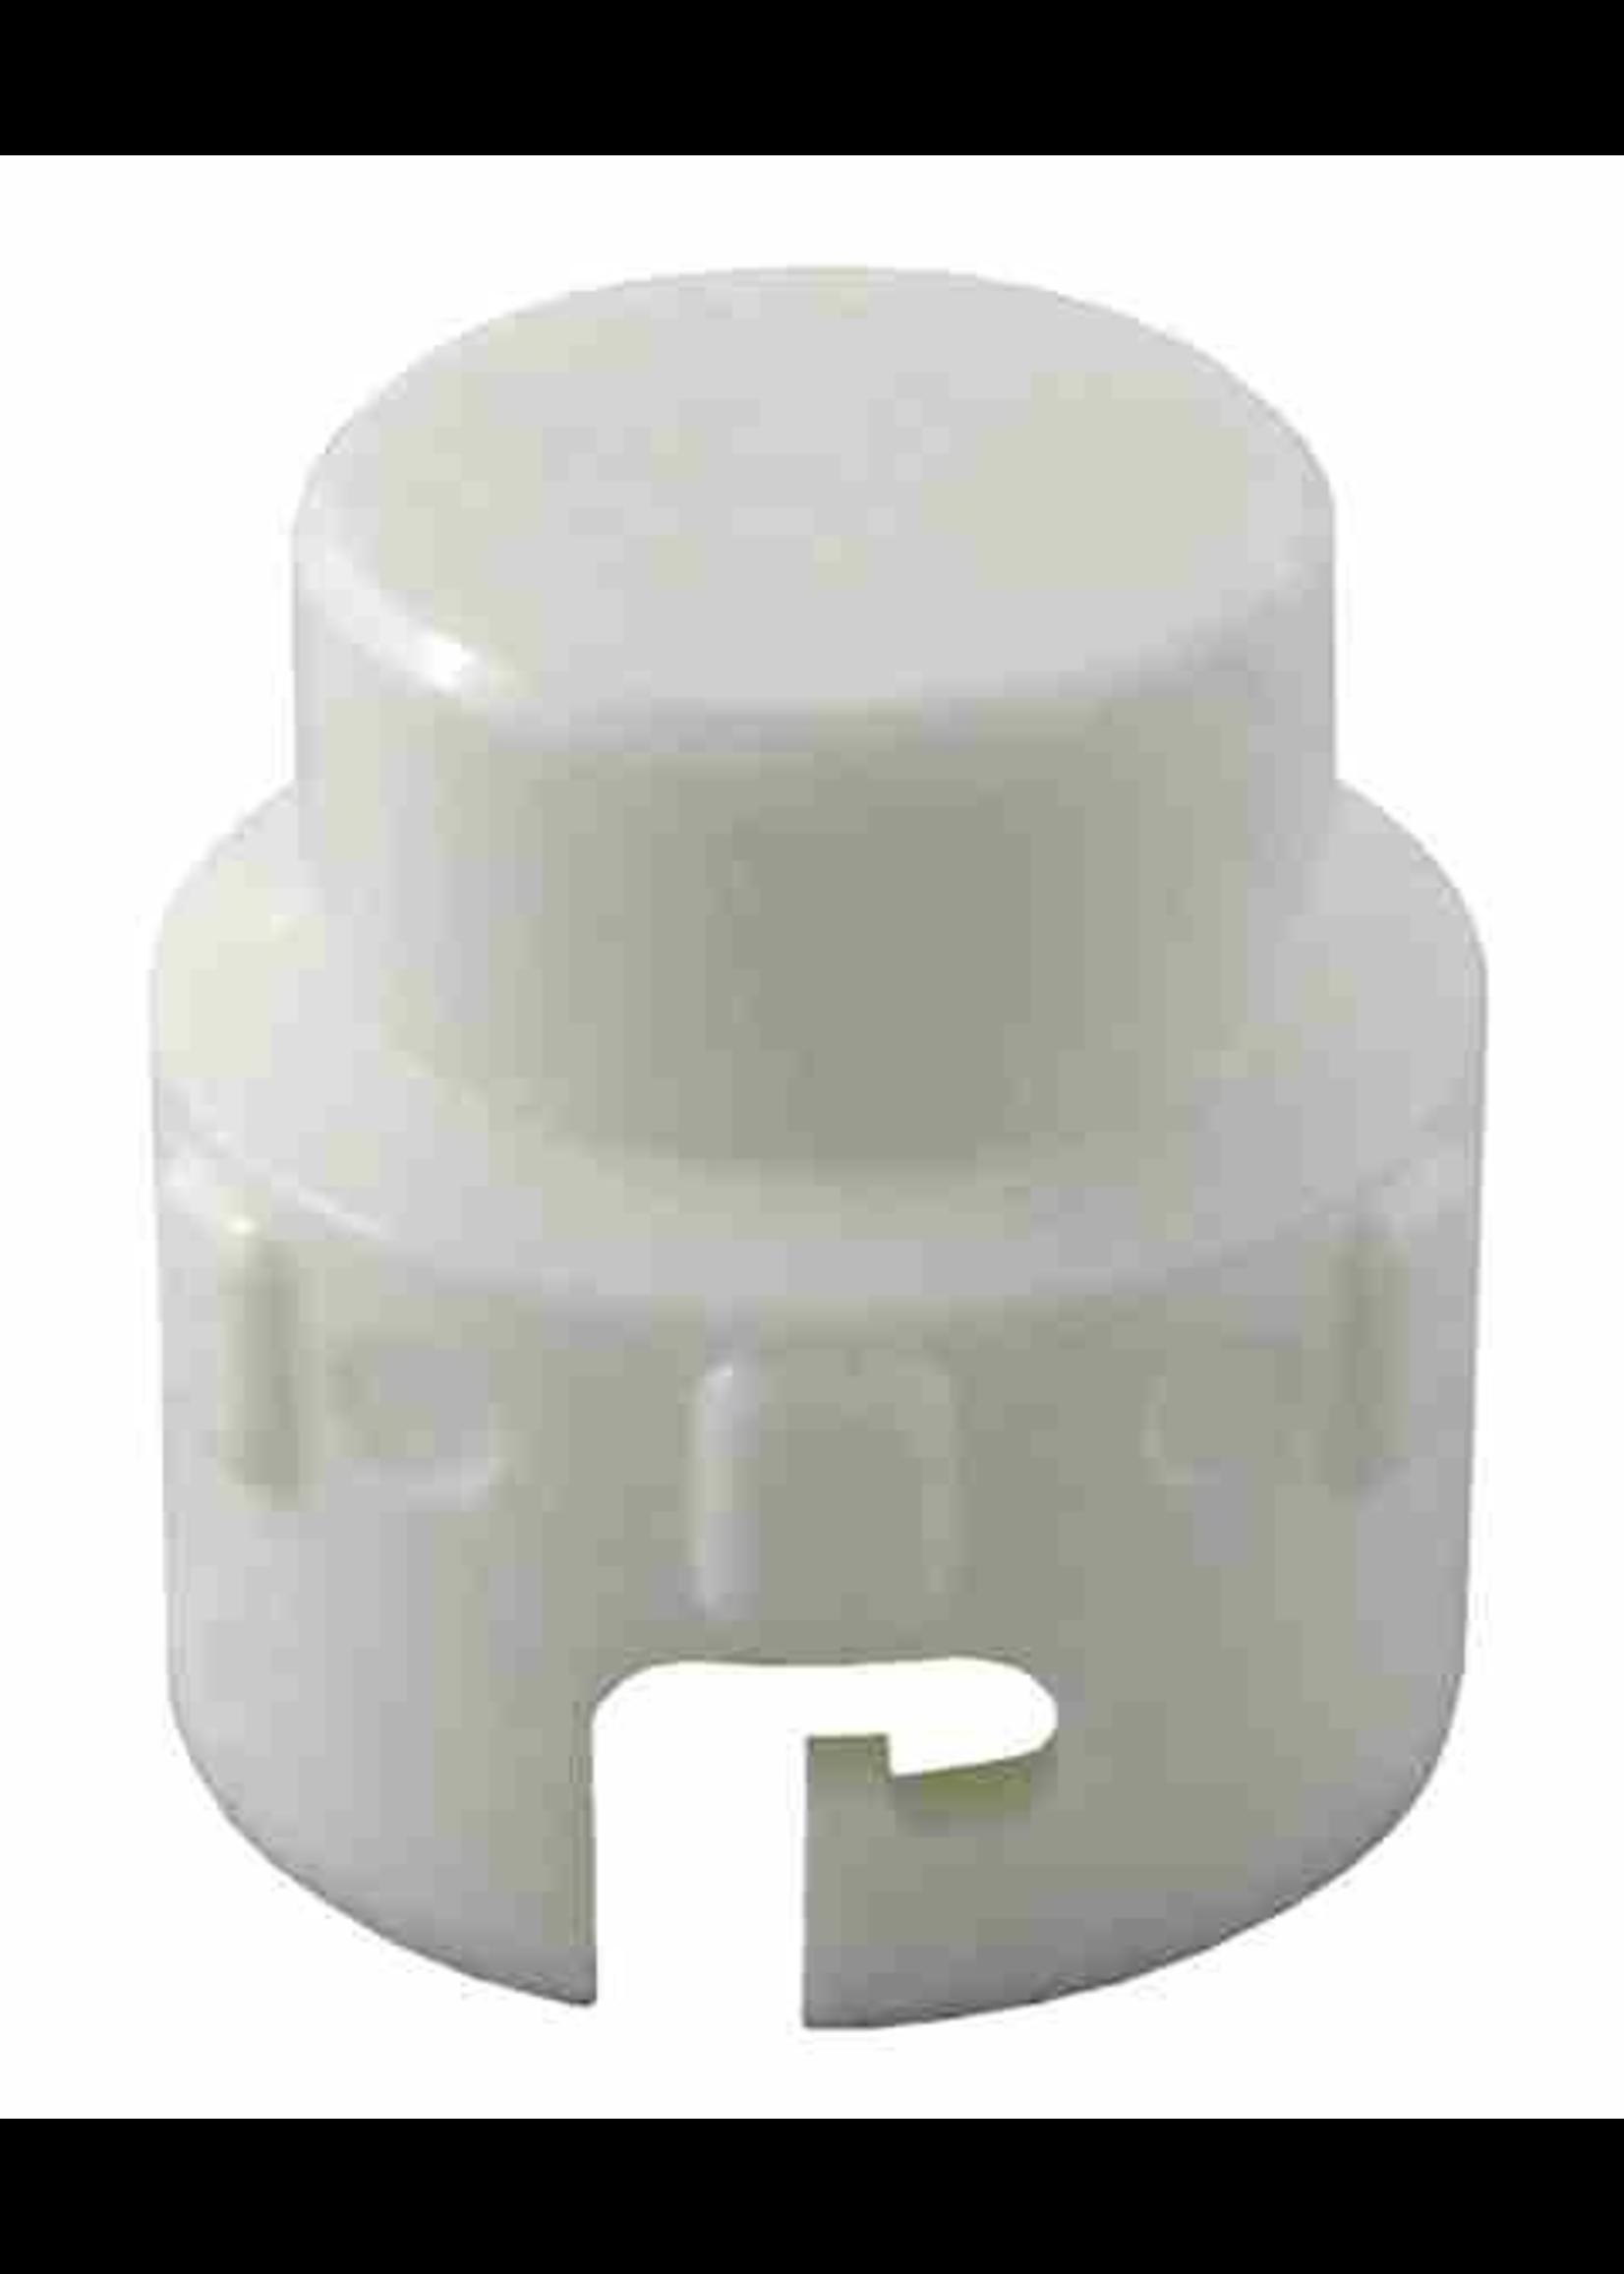 Kegging Plastic Pin Lock Keg Depressurizer for Gas Post - #B10